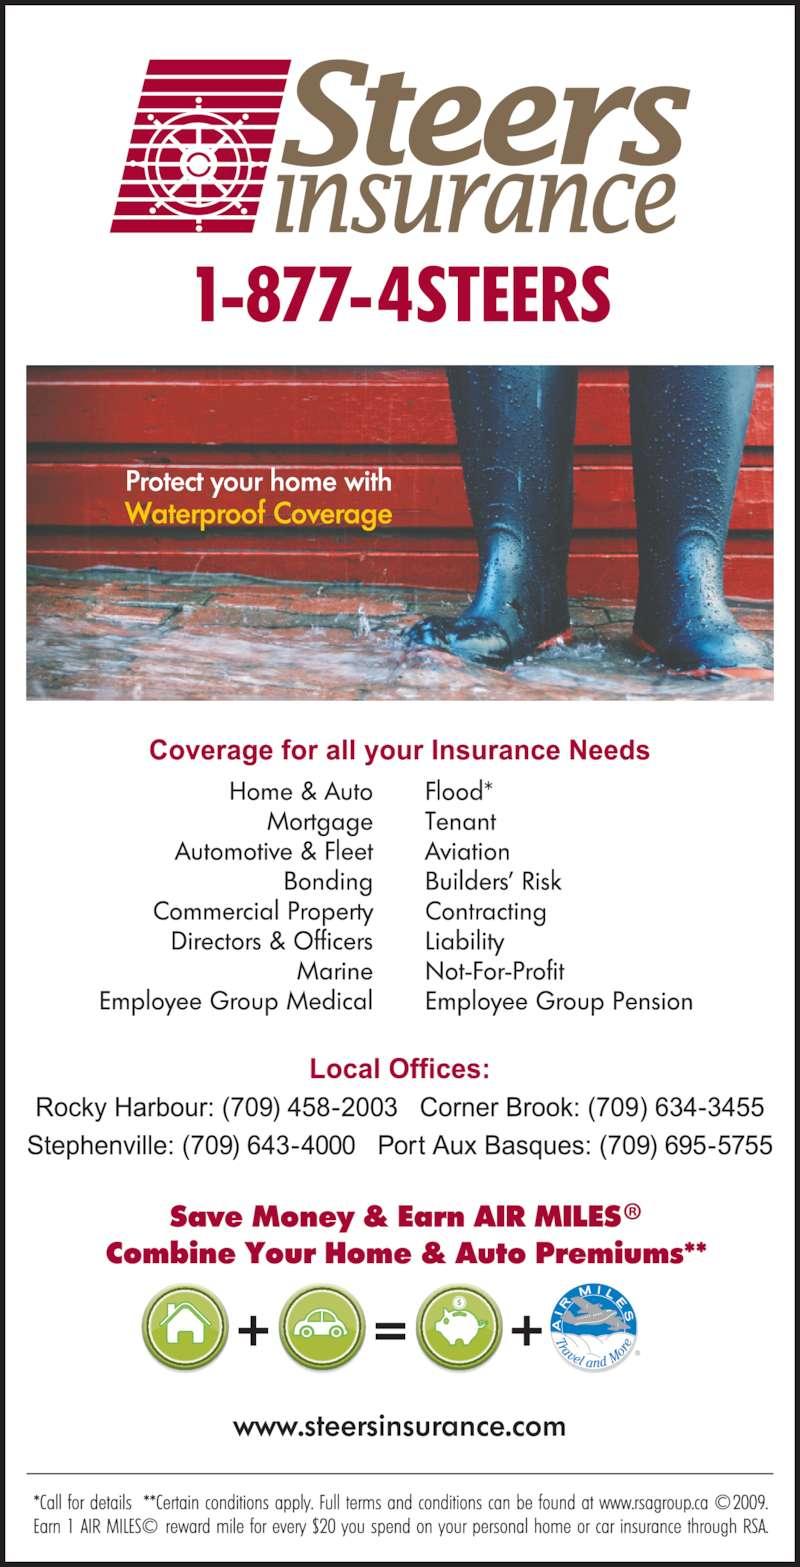 Steers Insurance Limited - Corner Brook, NL - 2 Main St ...